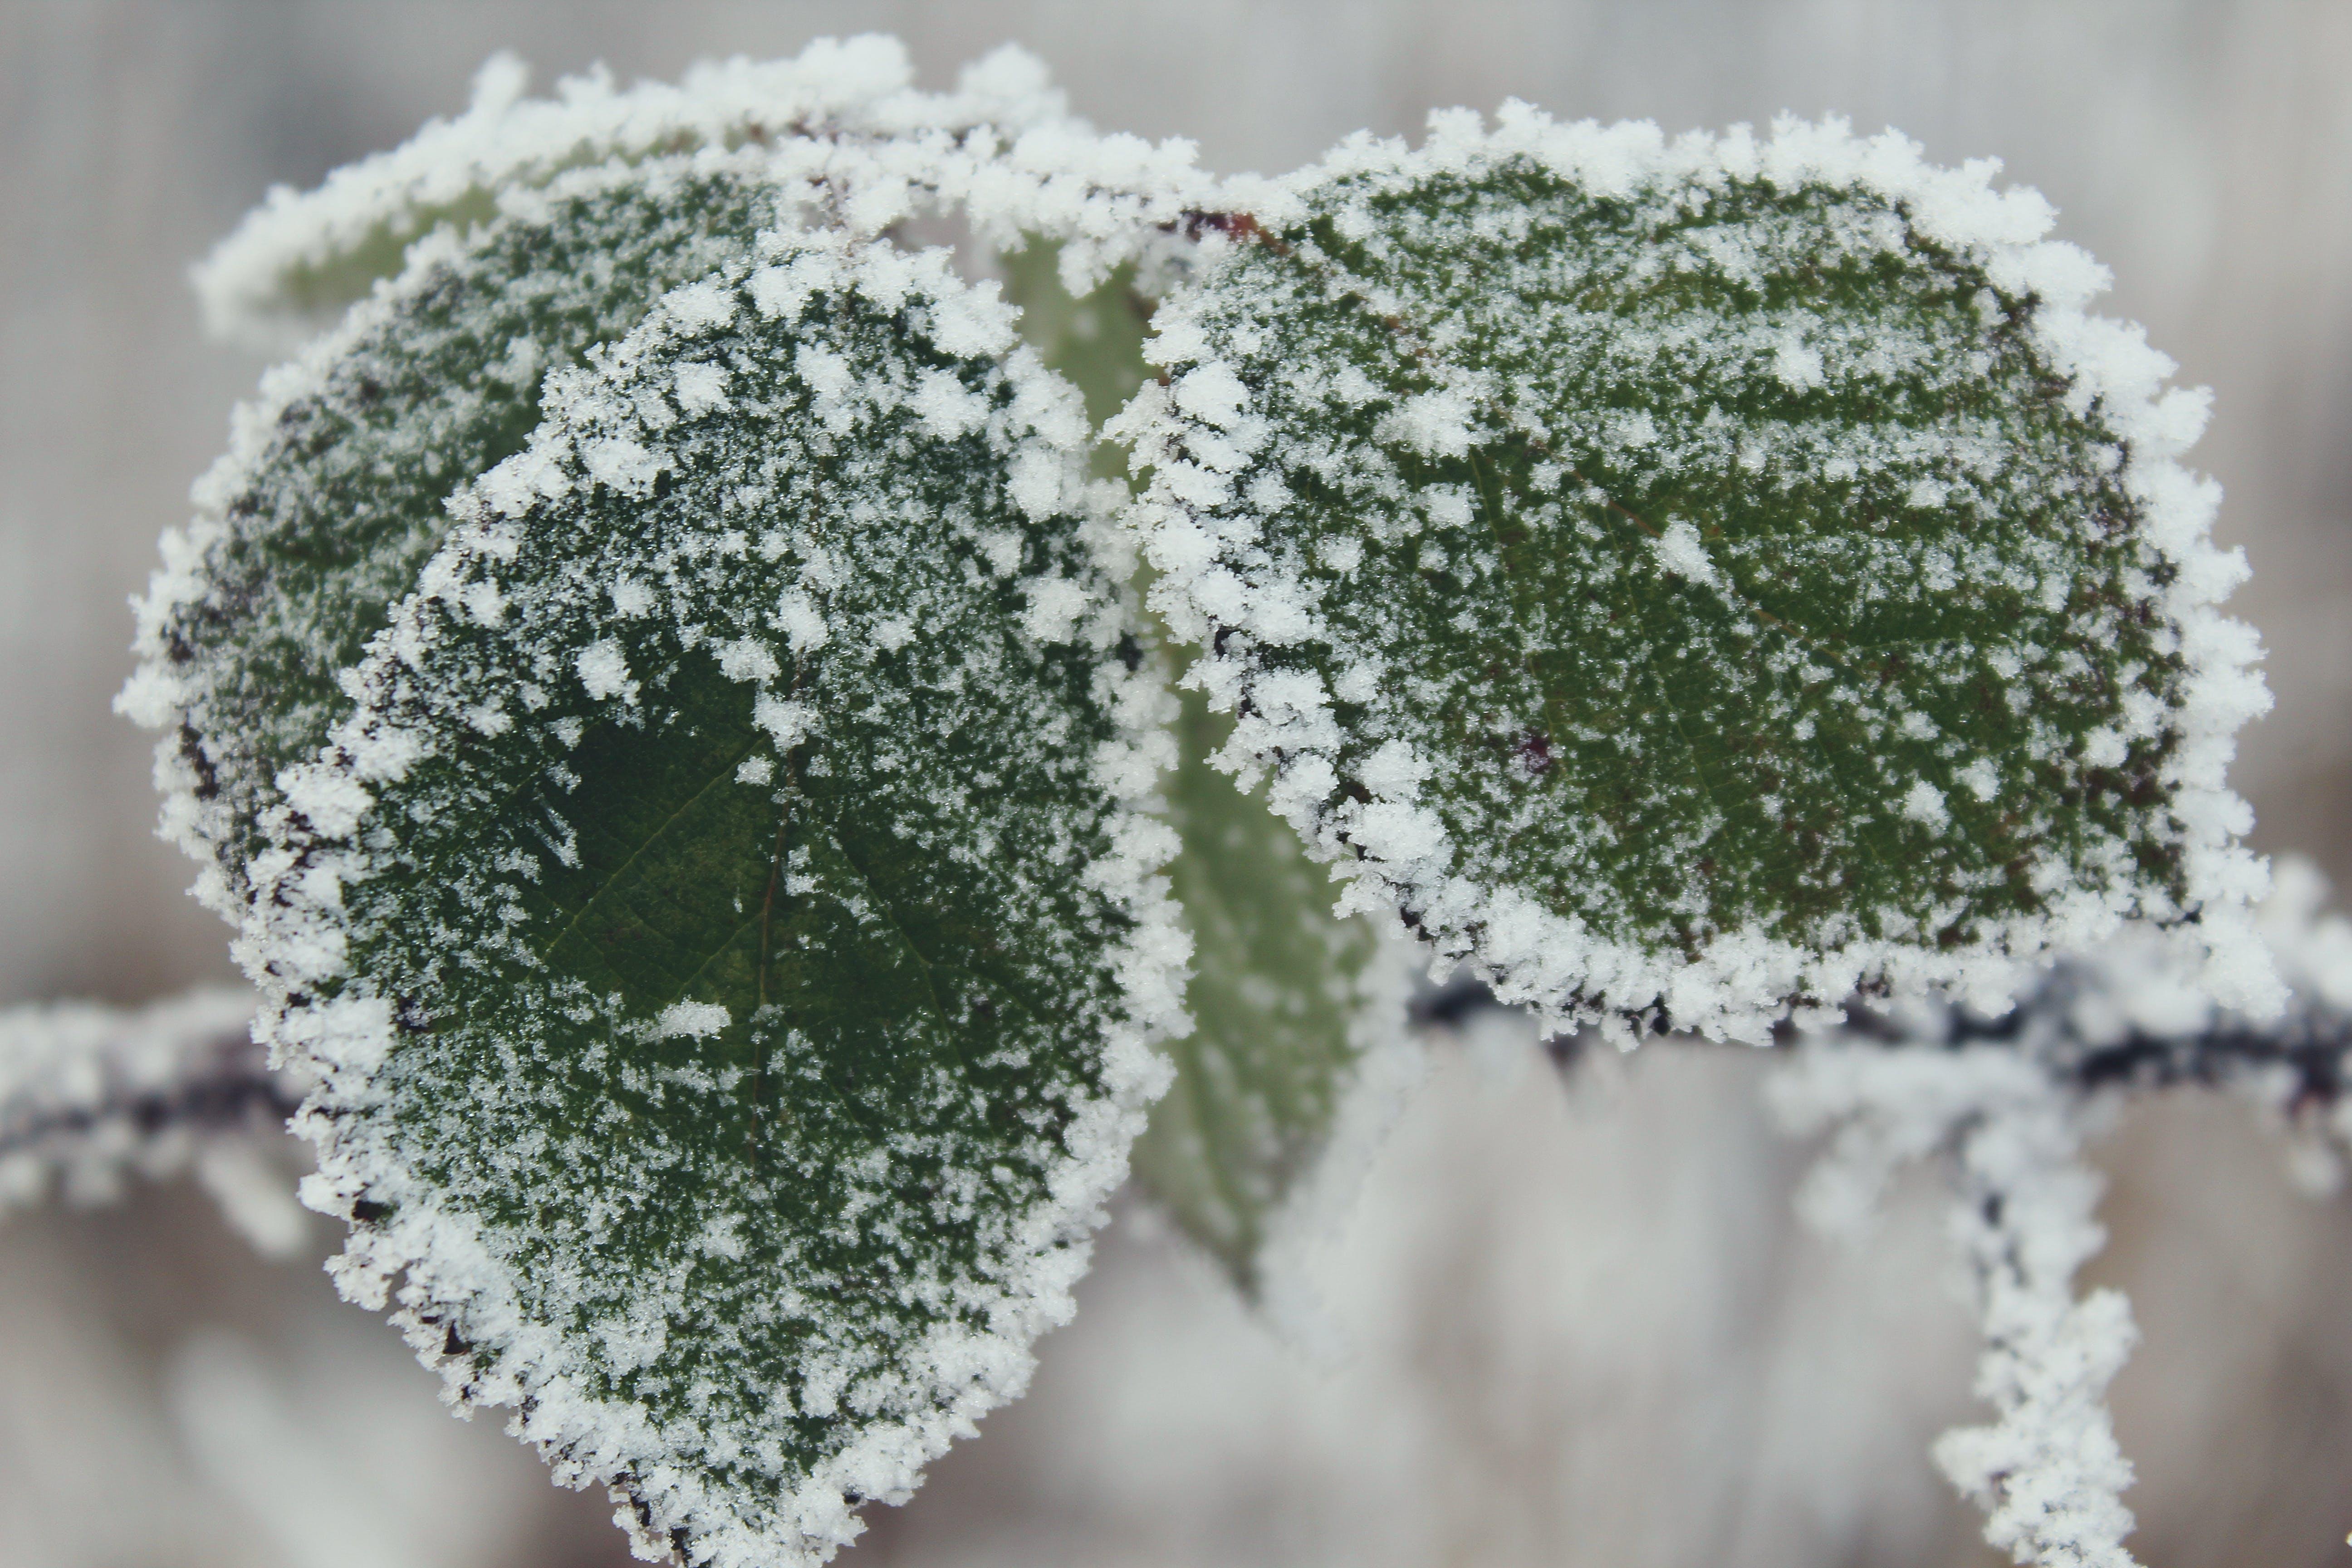 Kostenloses Stock Foto zu grüne pflanze, kalt, natur, winter